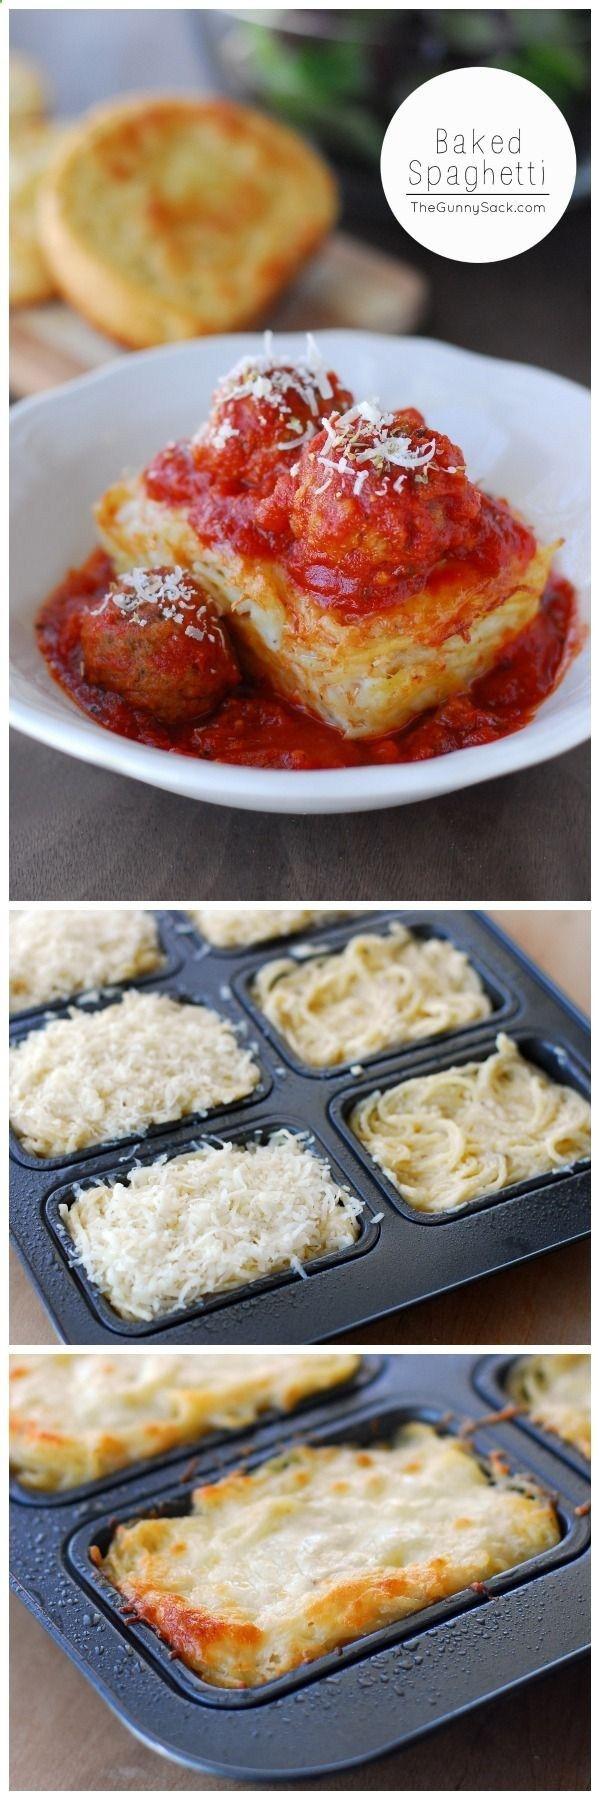 Baked Spaghetti recipe for mini loaves of creamy Alfredo baked spaghetti topped with meatballs and marinara sauce. Apartment food idea!!!